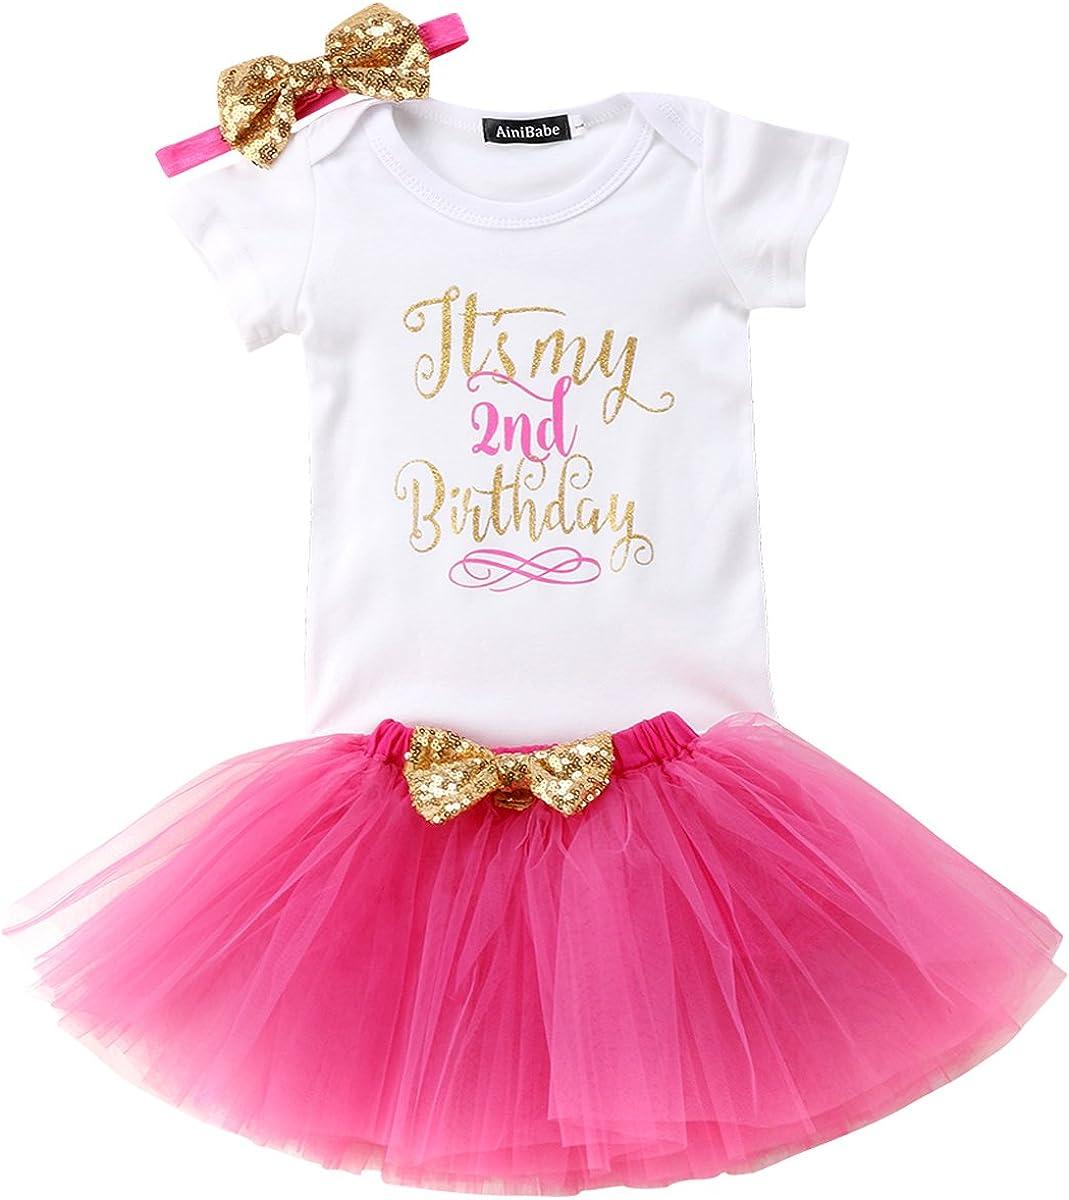 Flower Tiger Baby Girl Newborn Its My 1st//2st Birthday 3pcs Outfits Romper+Skirt+Headband